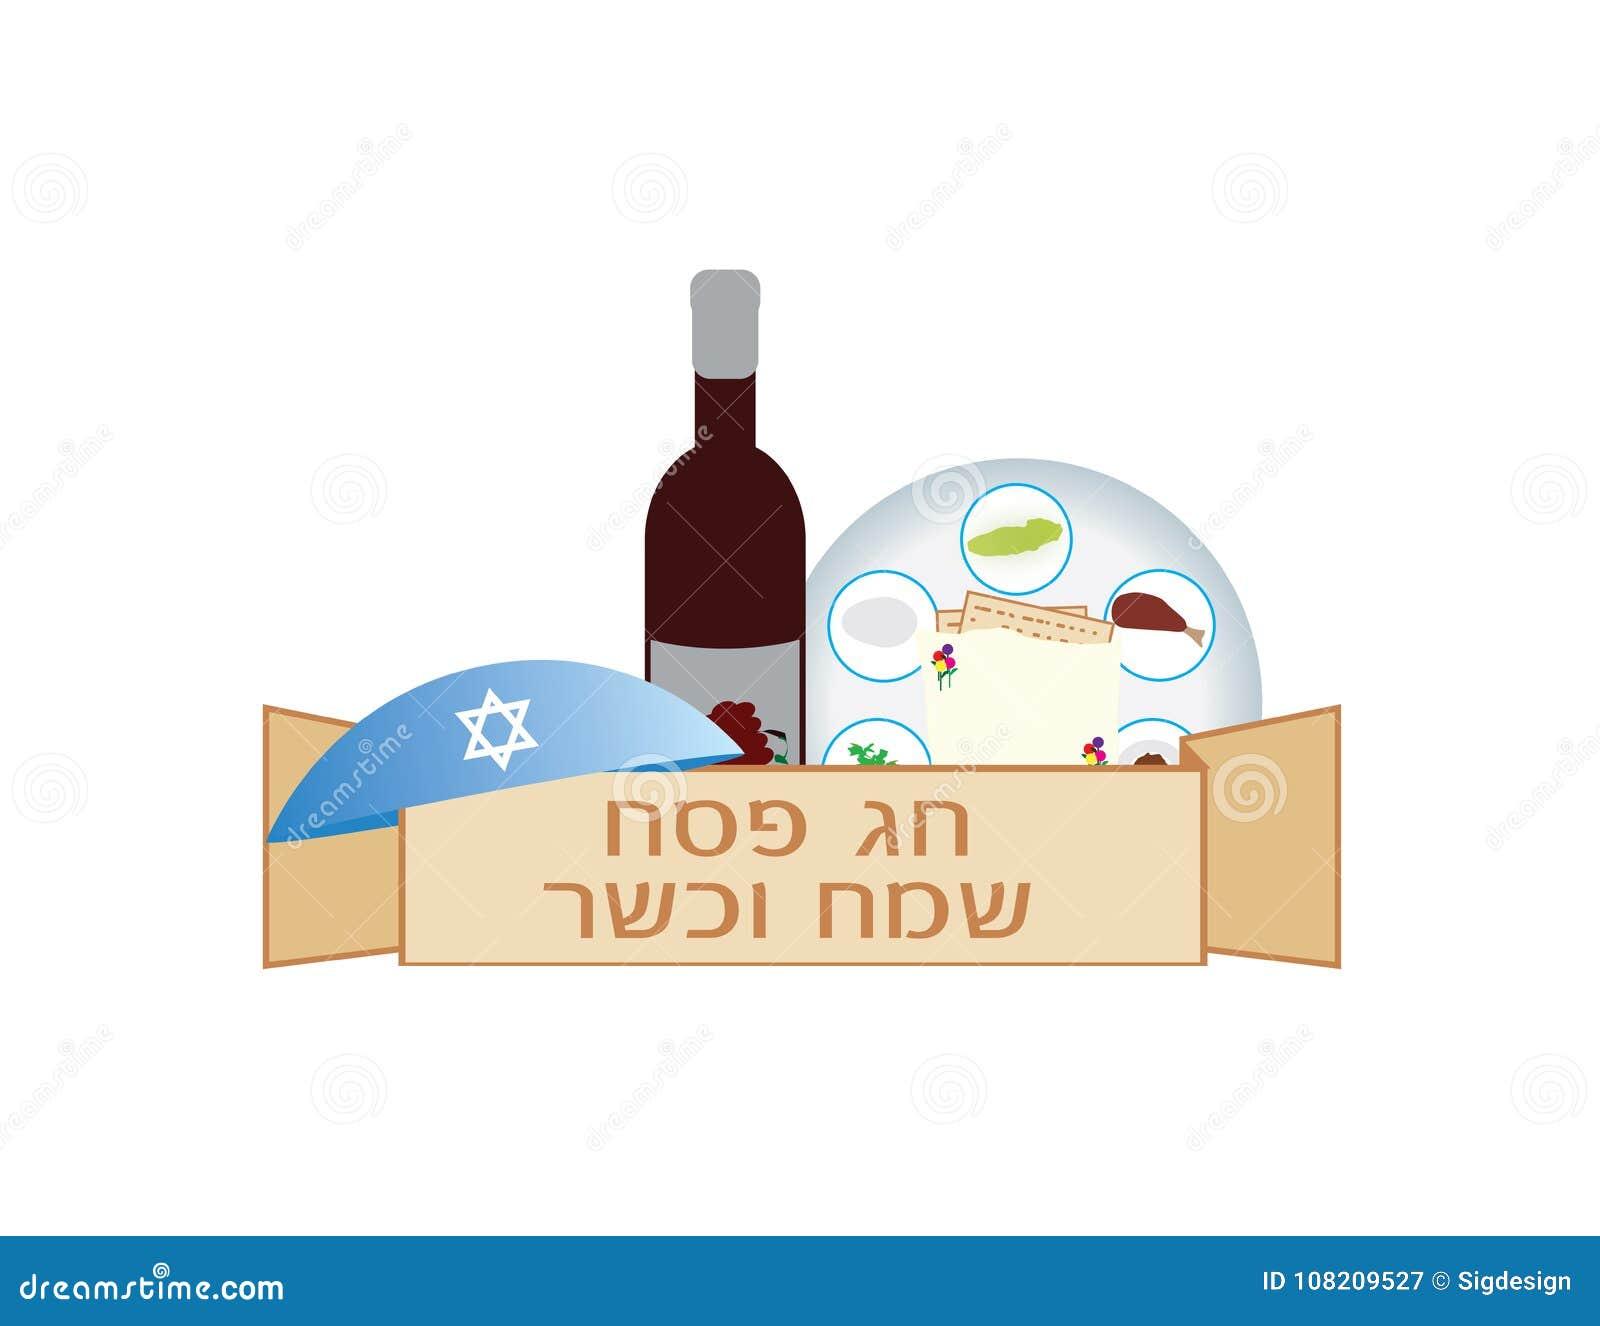 Passover jewish holiday banner hebrew passover greeting wine passover jewish holiday banner with hebrew greeting kosher and happy passover m4hsunfo